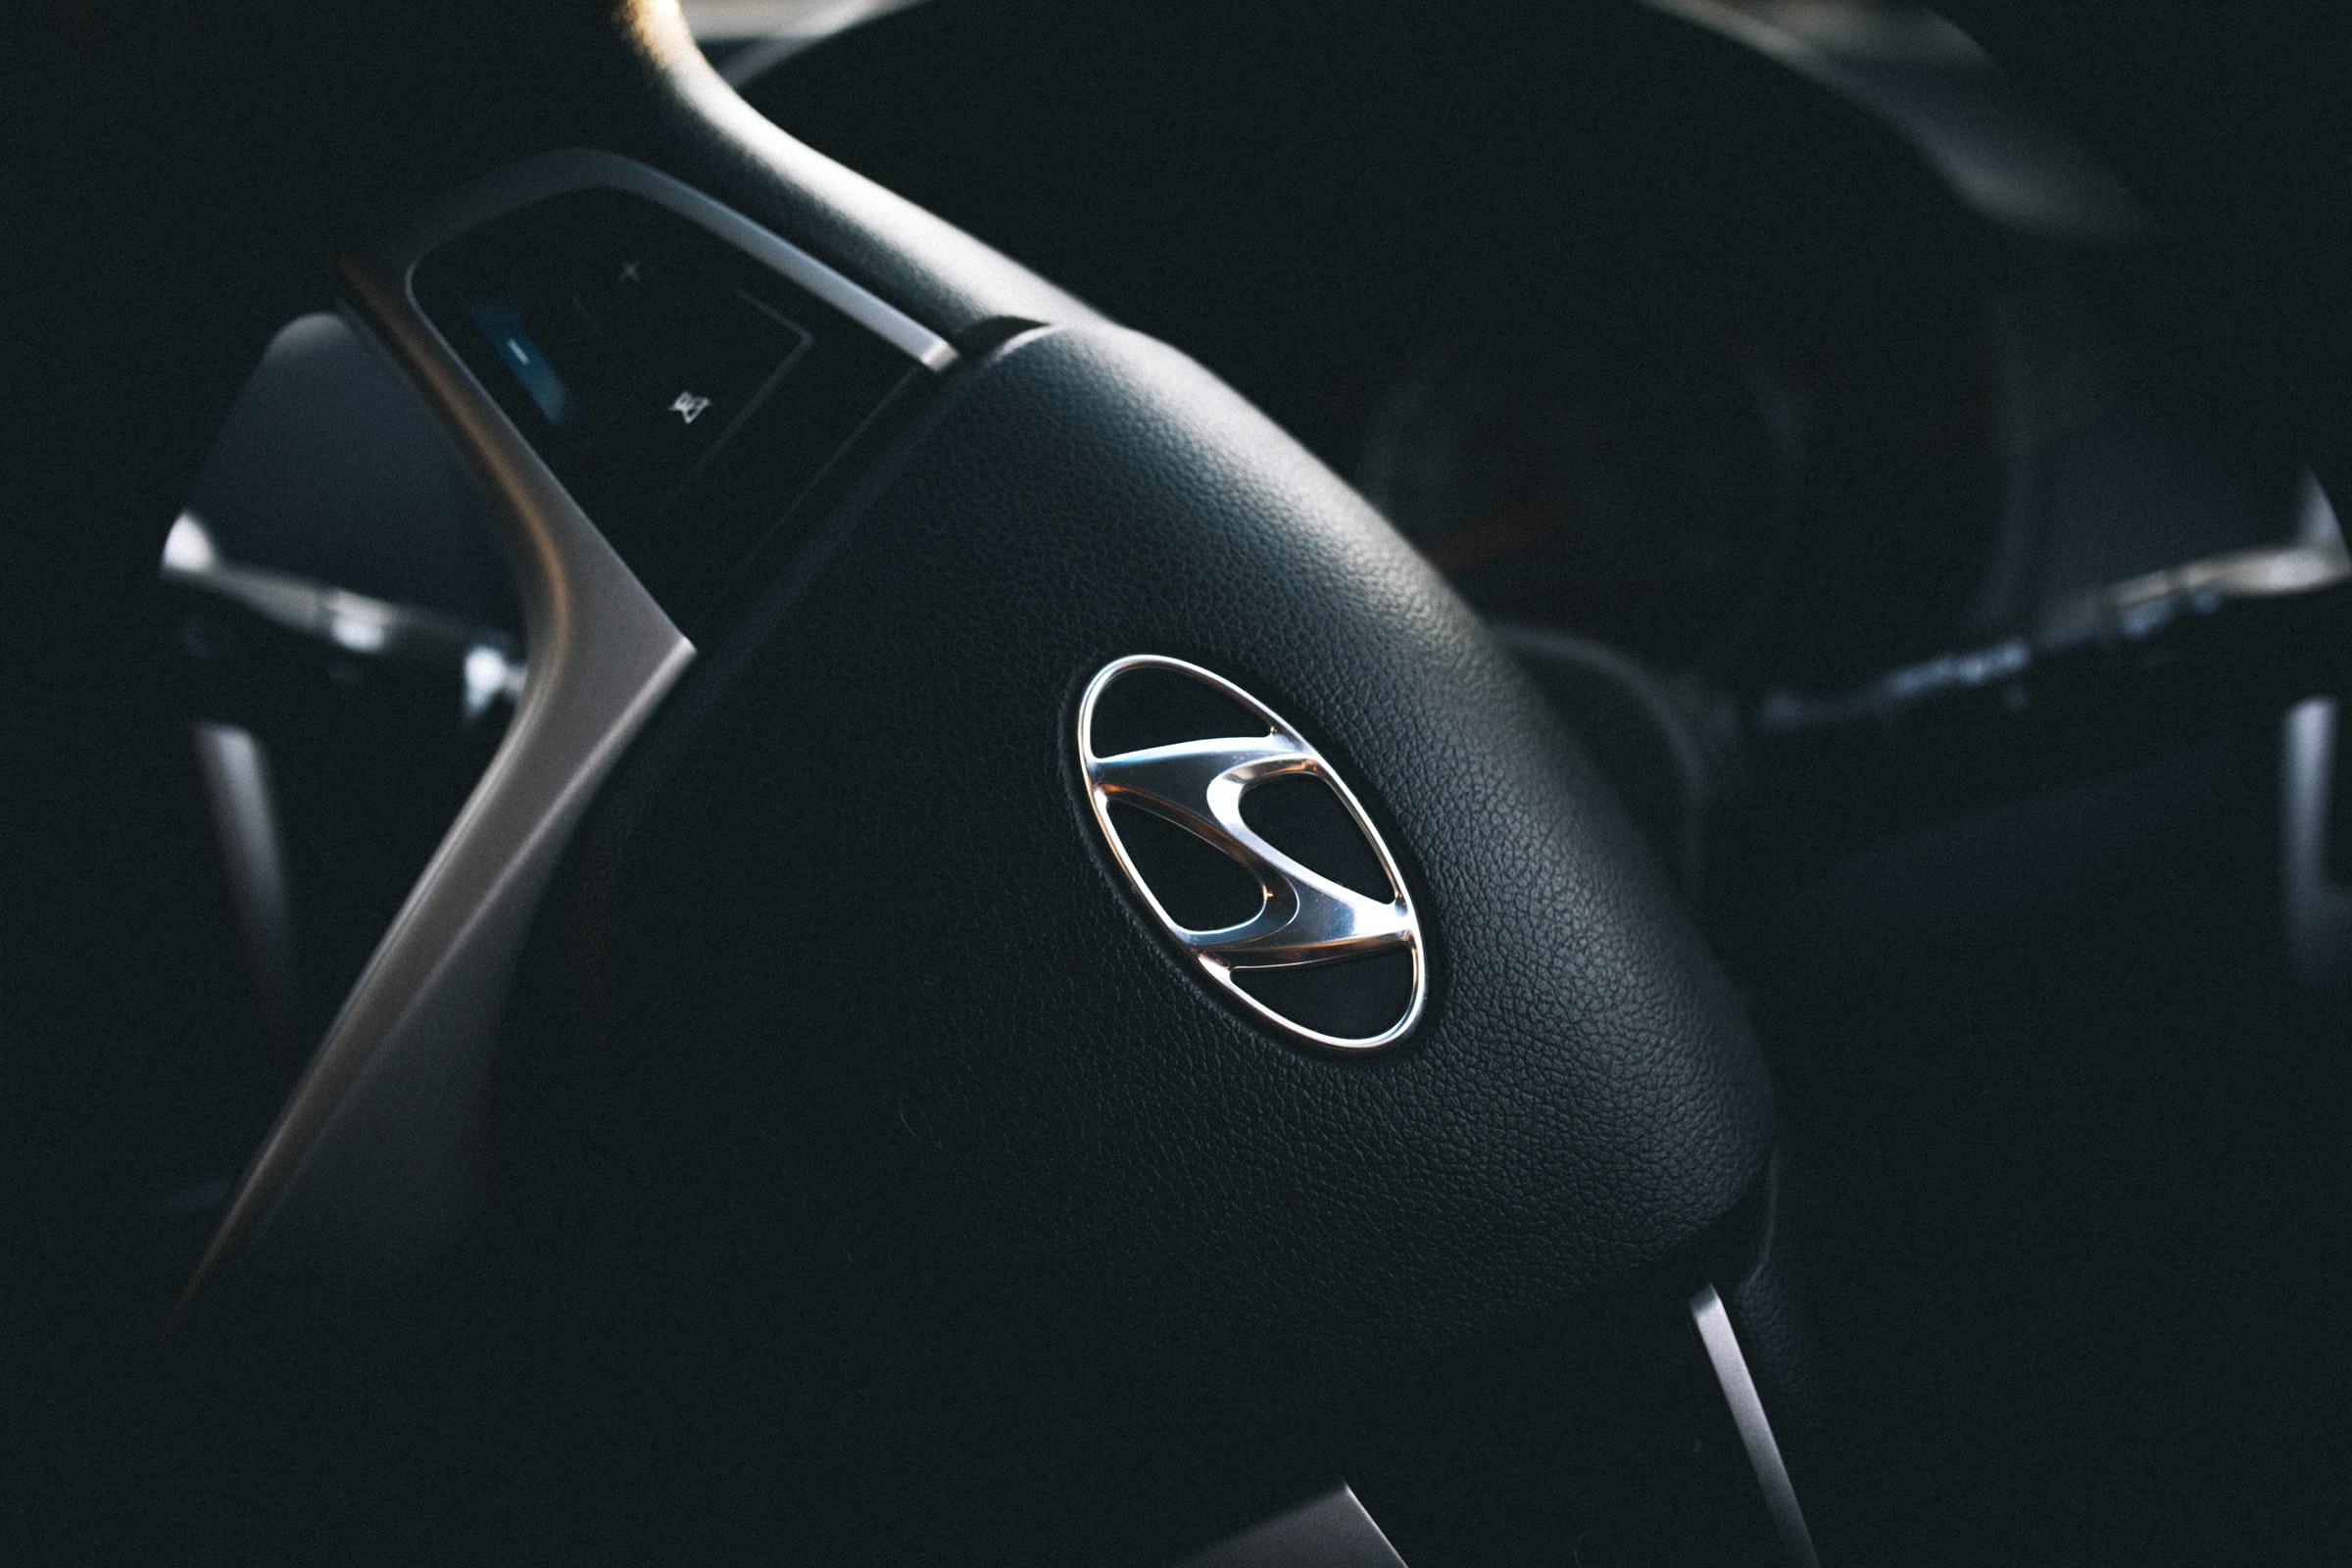 Hyundai Ioniq 5 Electric Vehicle Usable In Self-Driving Fleet For Lyft